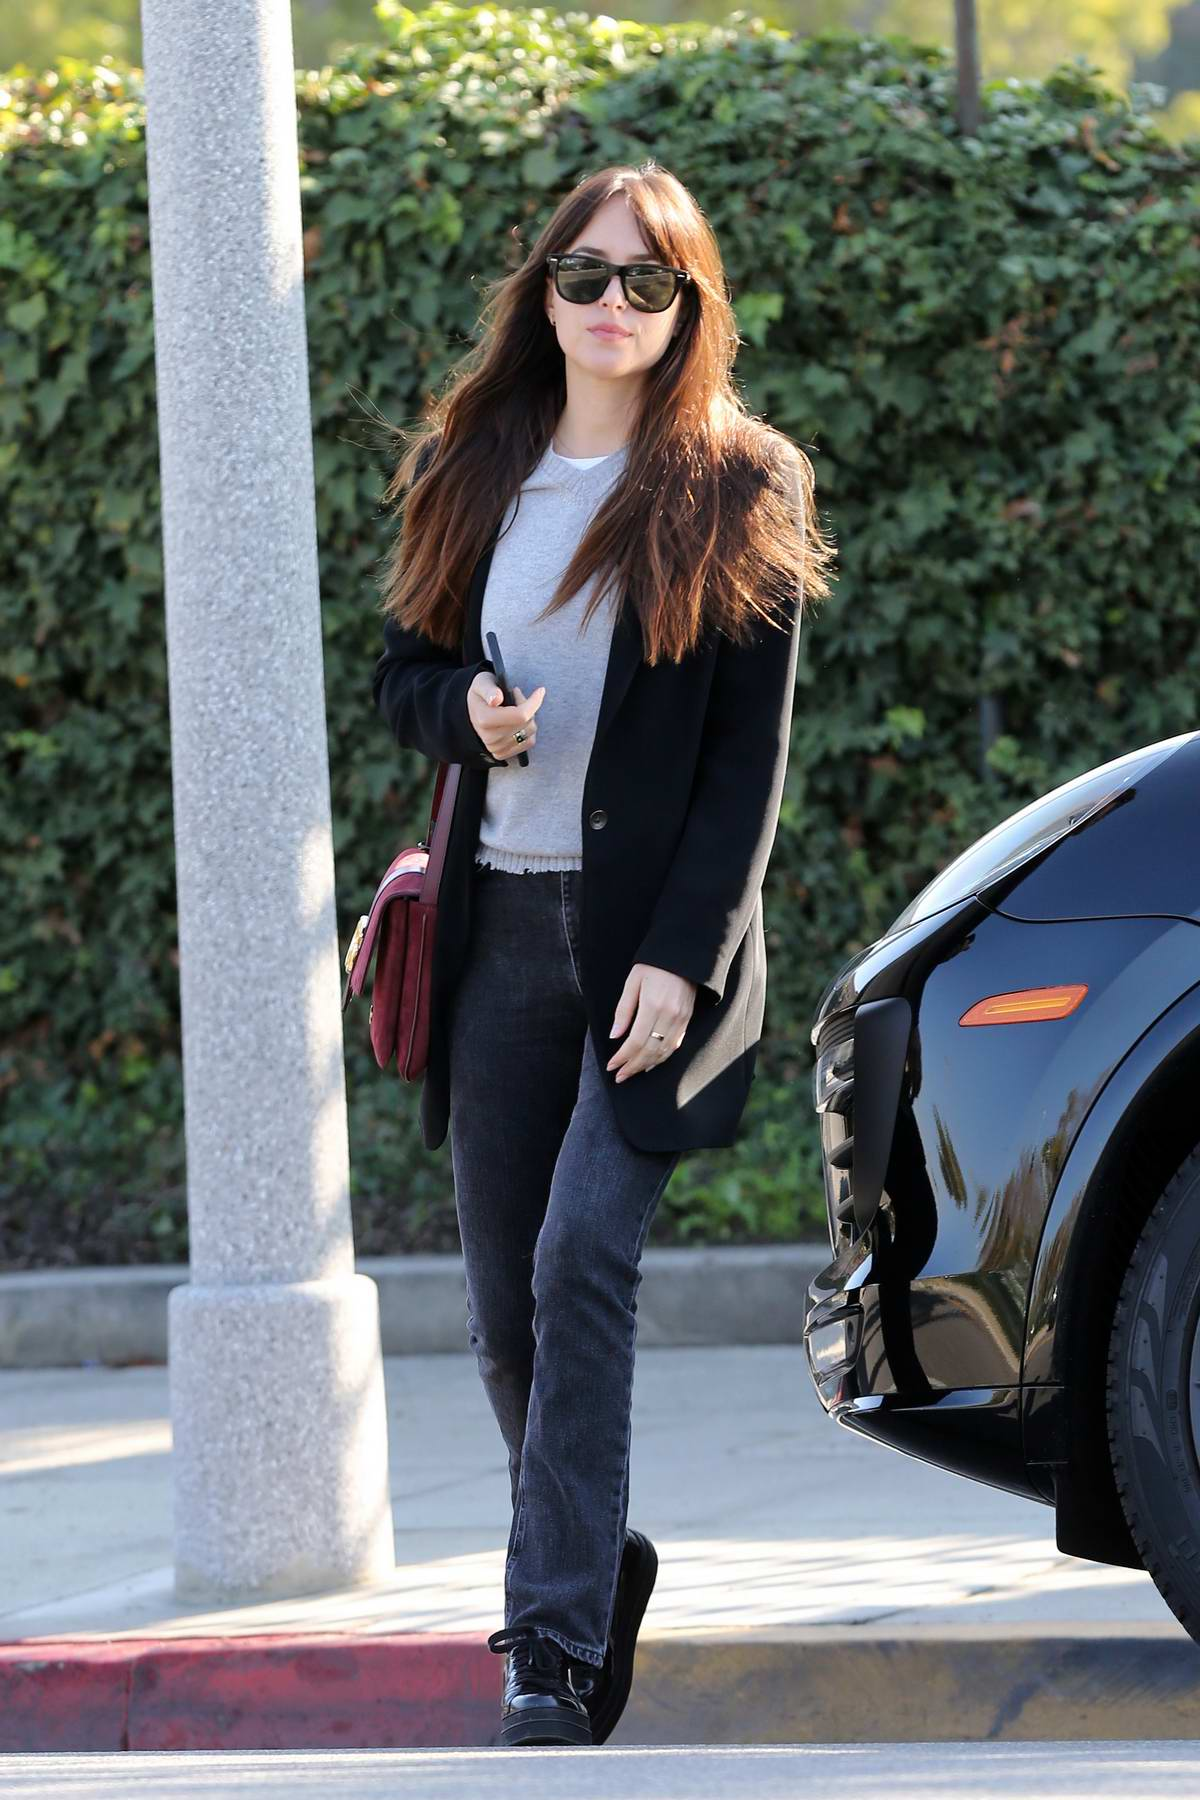 Dakota Johnson looks stunning as she leaves a skin clinic in Beverly Hills, Los Angeles